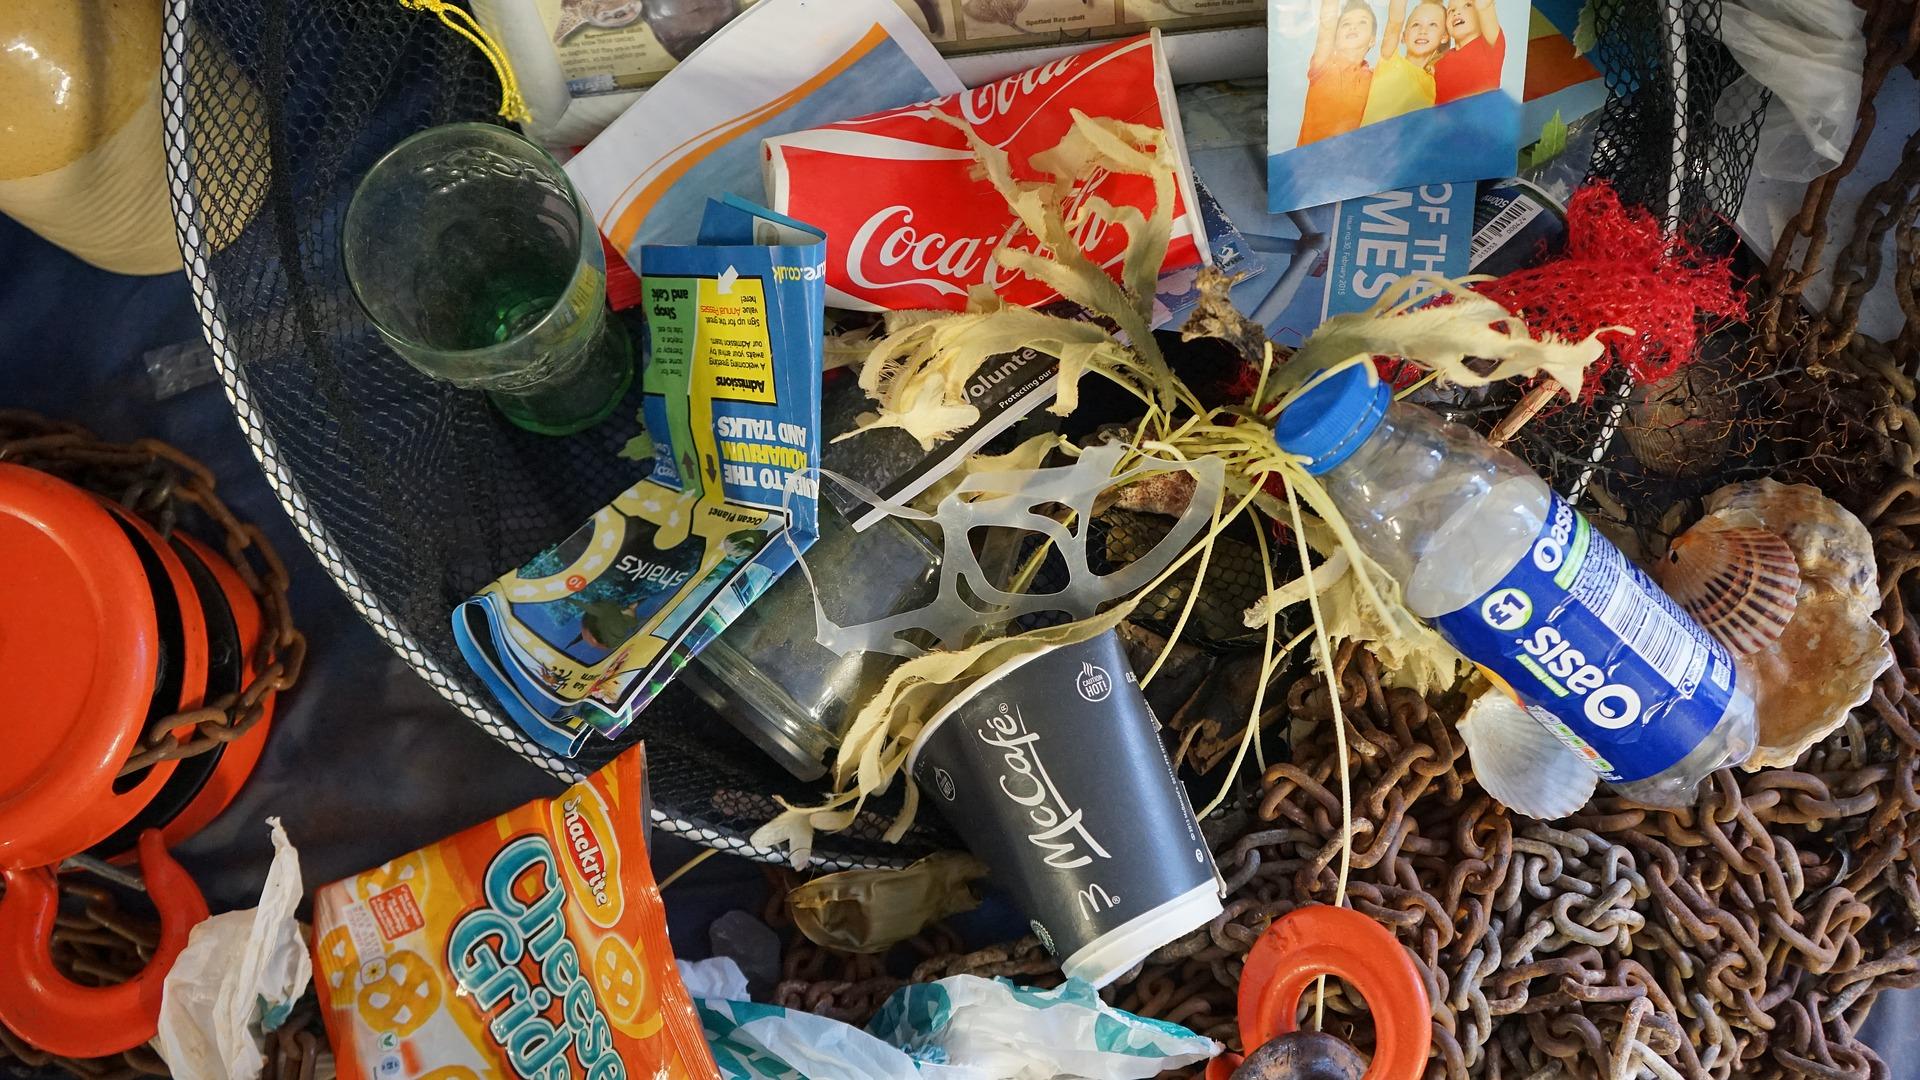 ООН запустила кампанию #CleanSeas по очистке океана от пластика